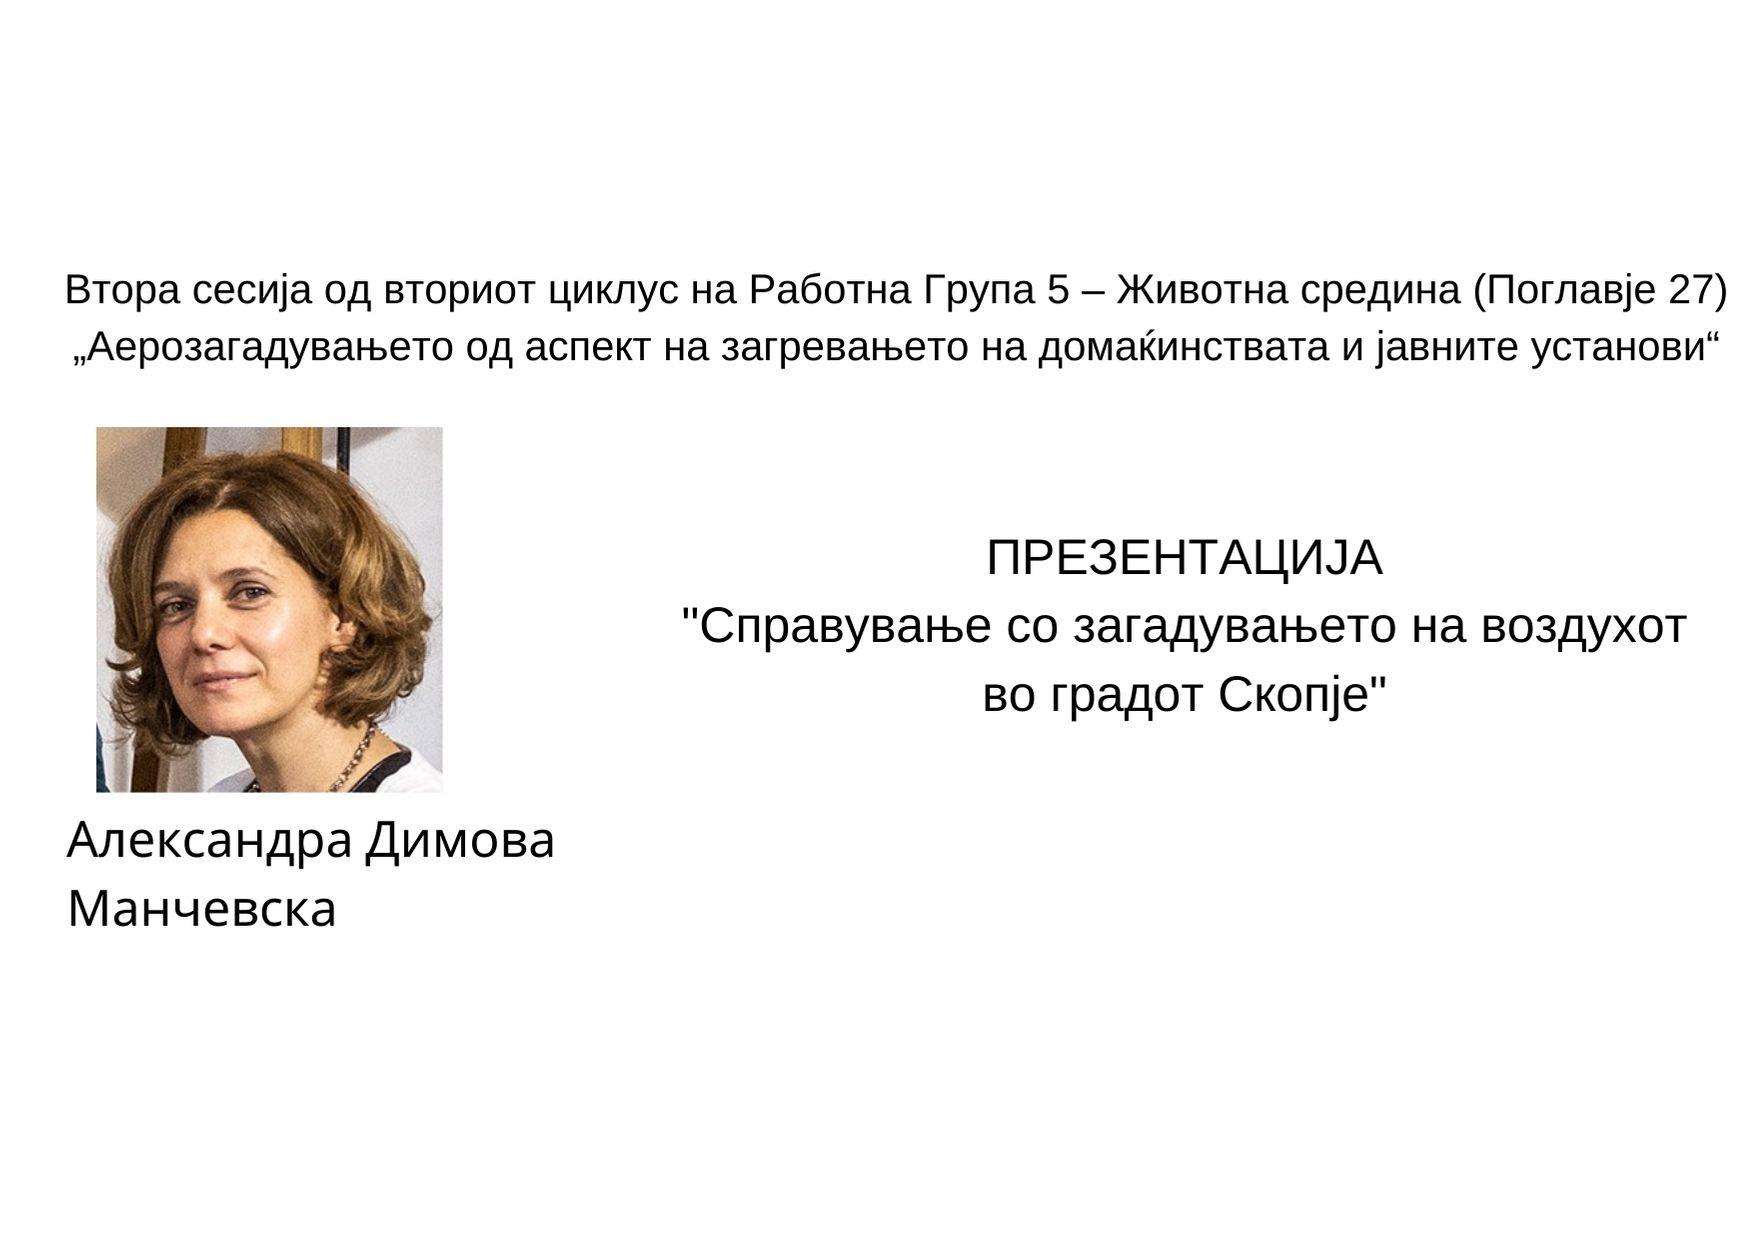 Александра Димова